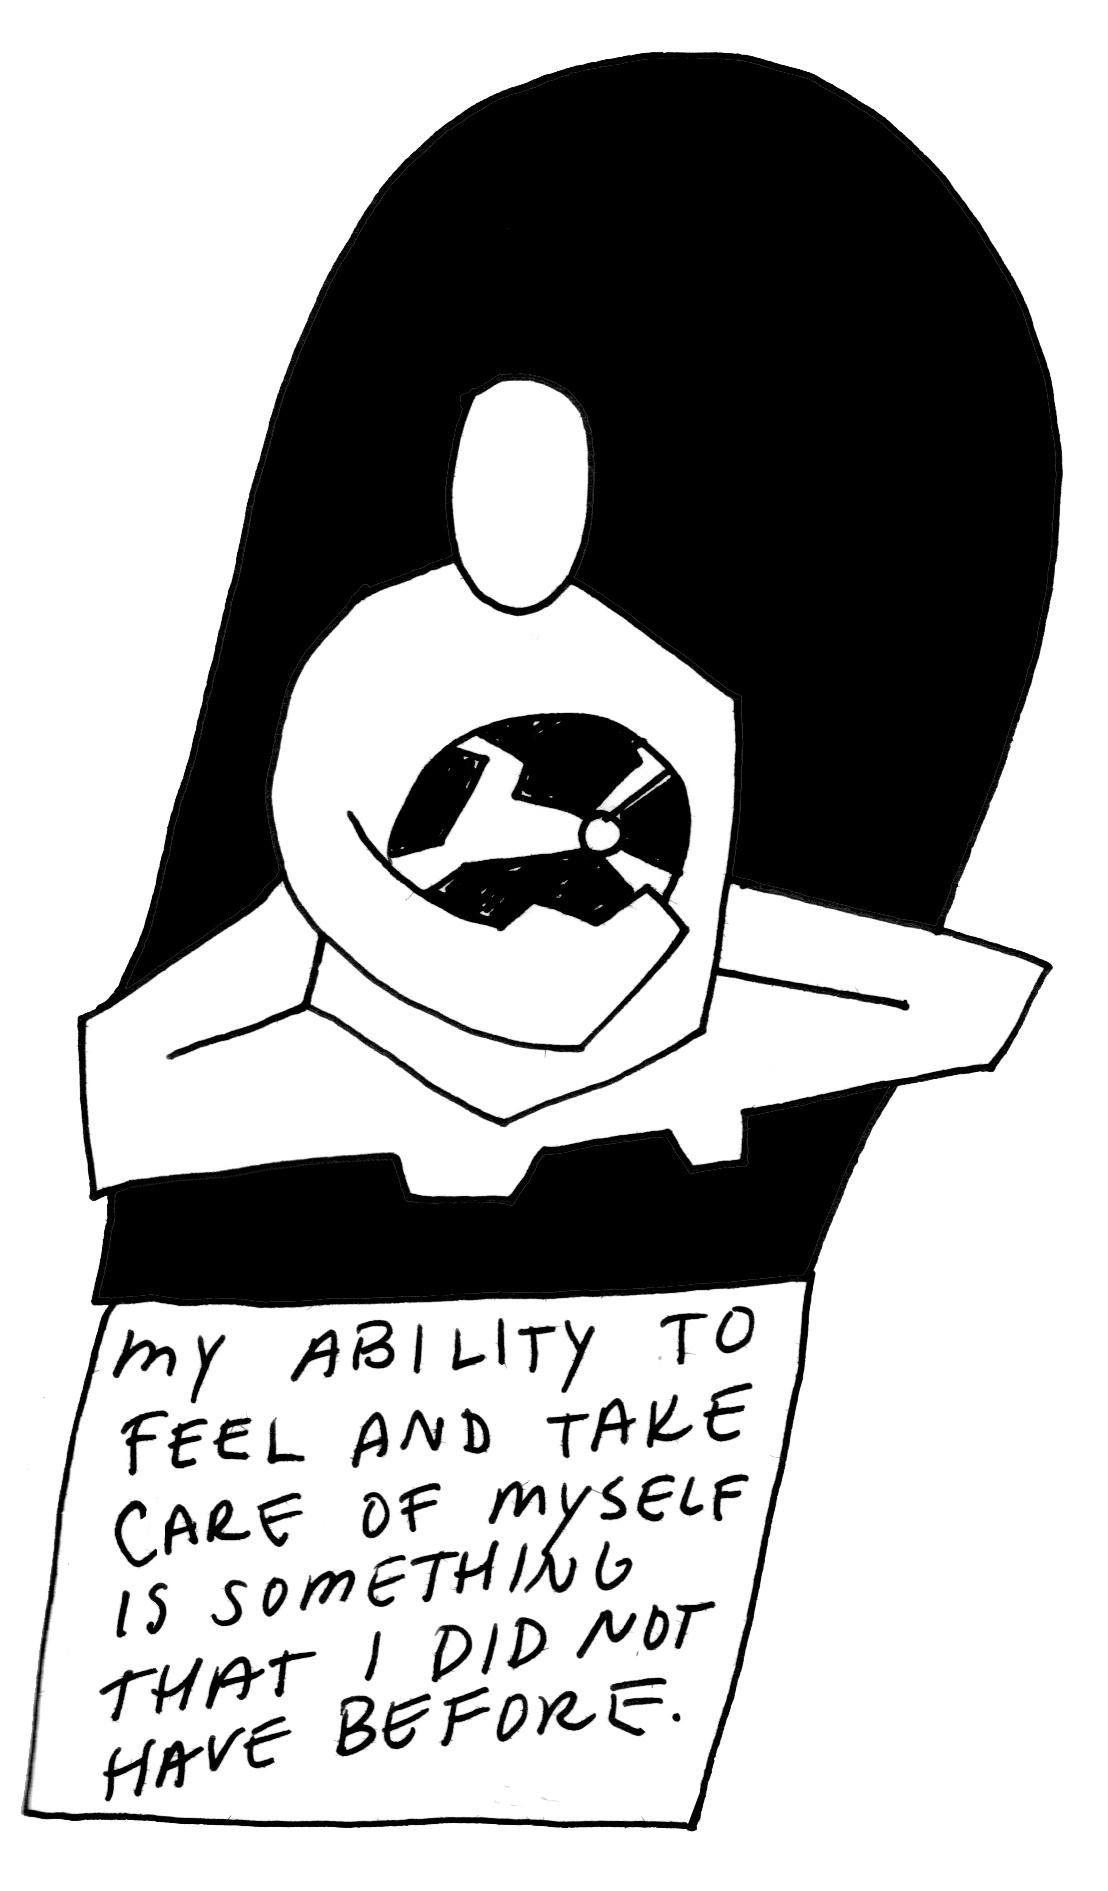 10 my ability to feel-c3.jpg